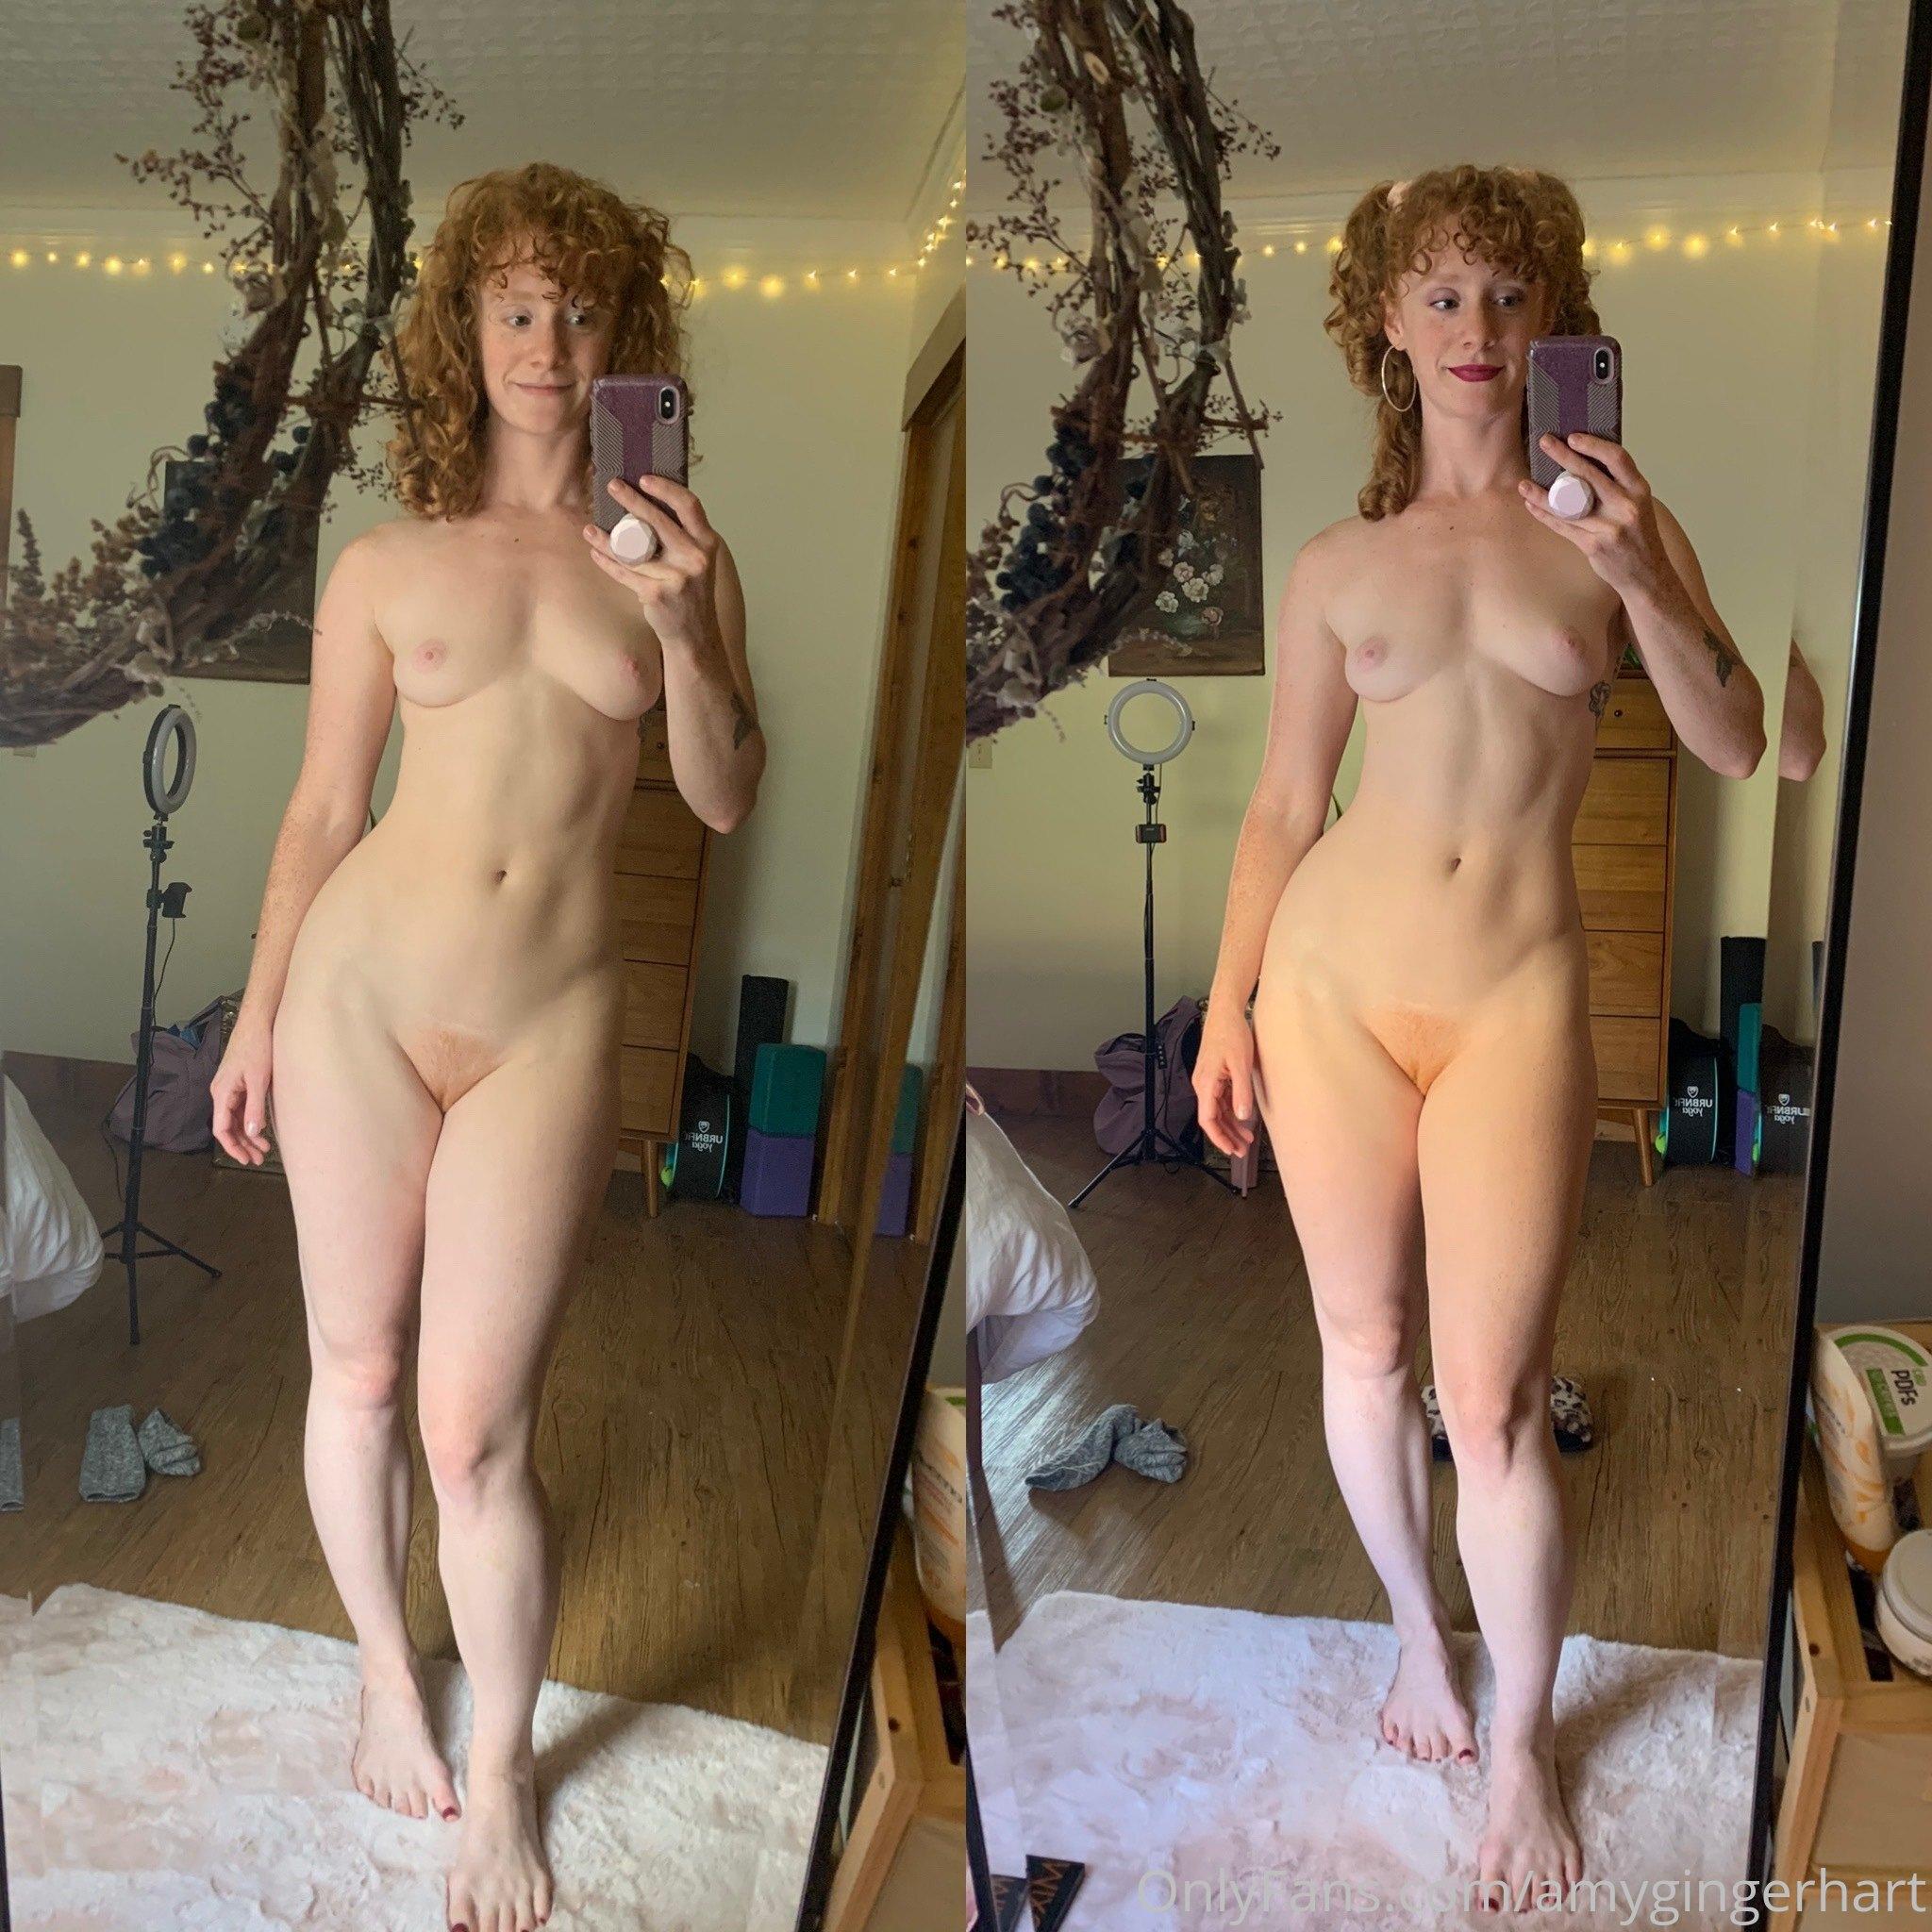 Amy Hart, Amygingerhart, Onlyfans 0025